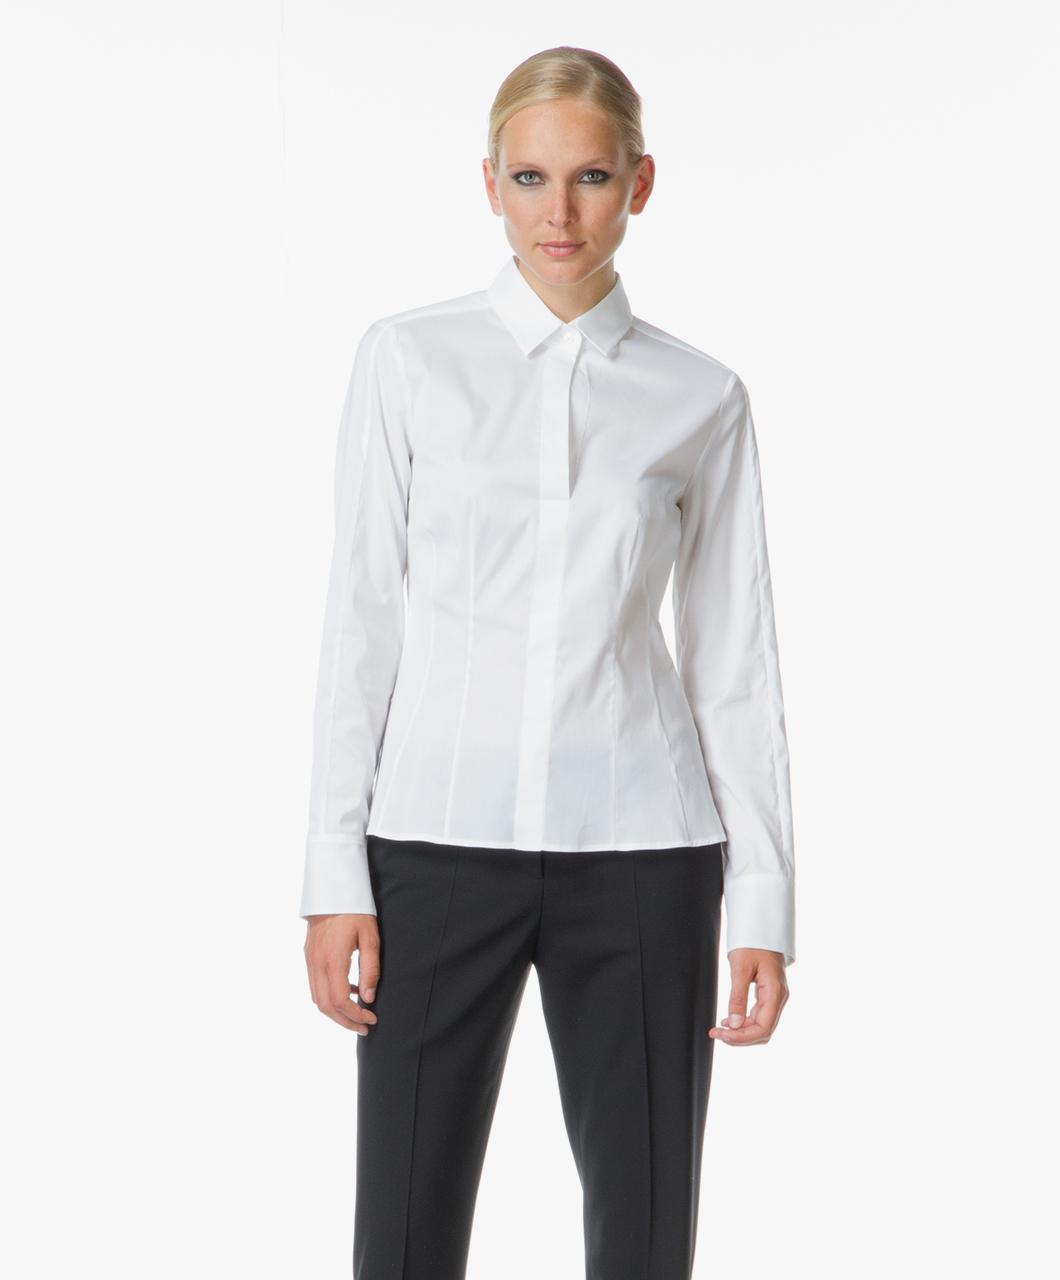 boss bashina slim fit shirt white bashina 100 10105846. Black Bedroom Furniture Sets. Home Design Ideas